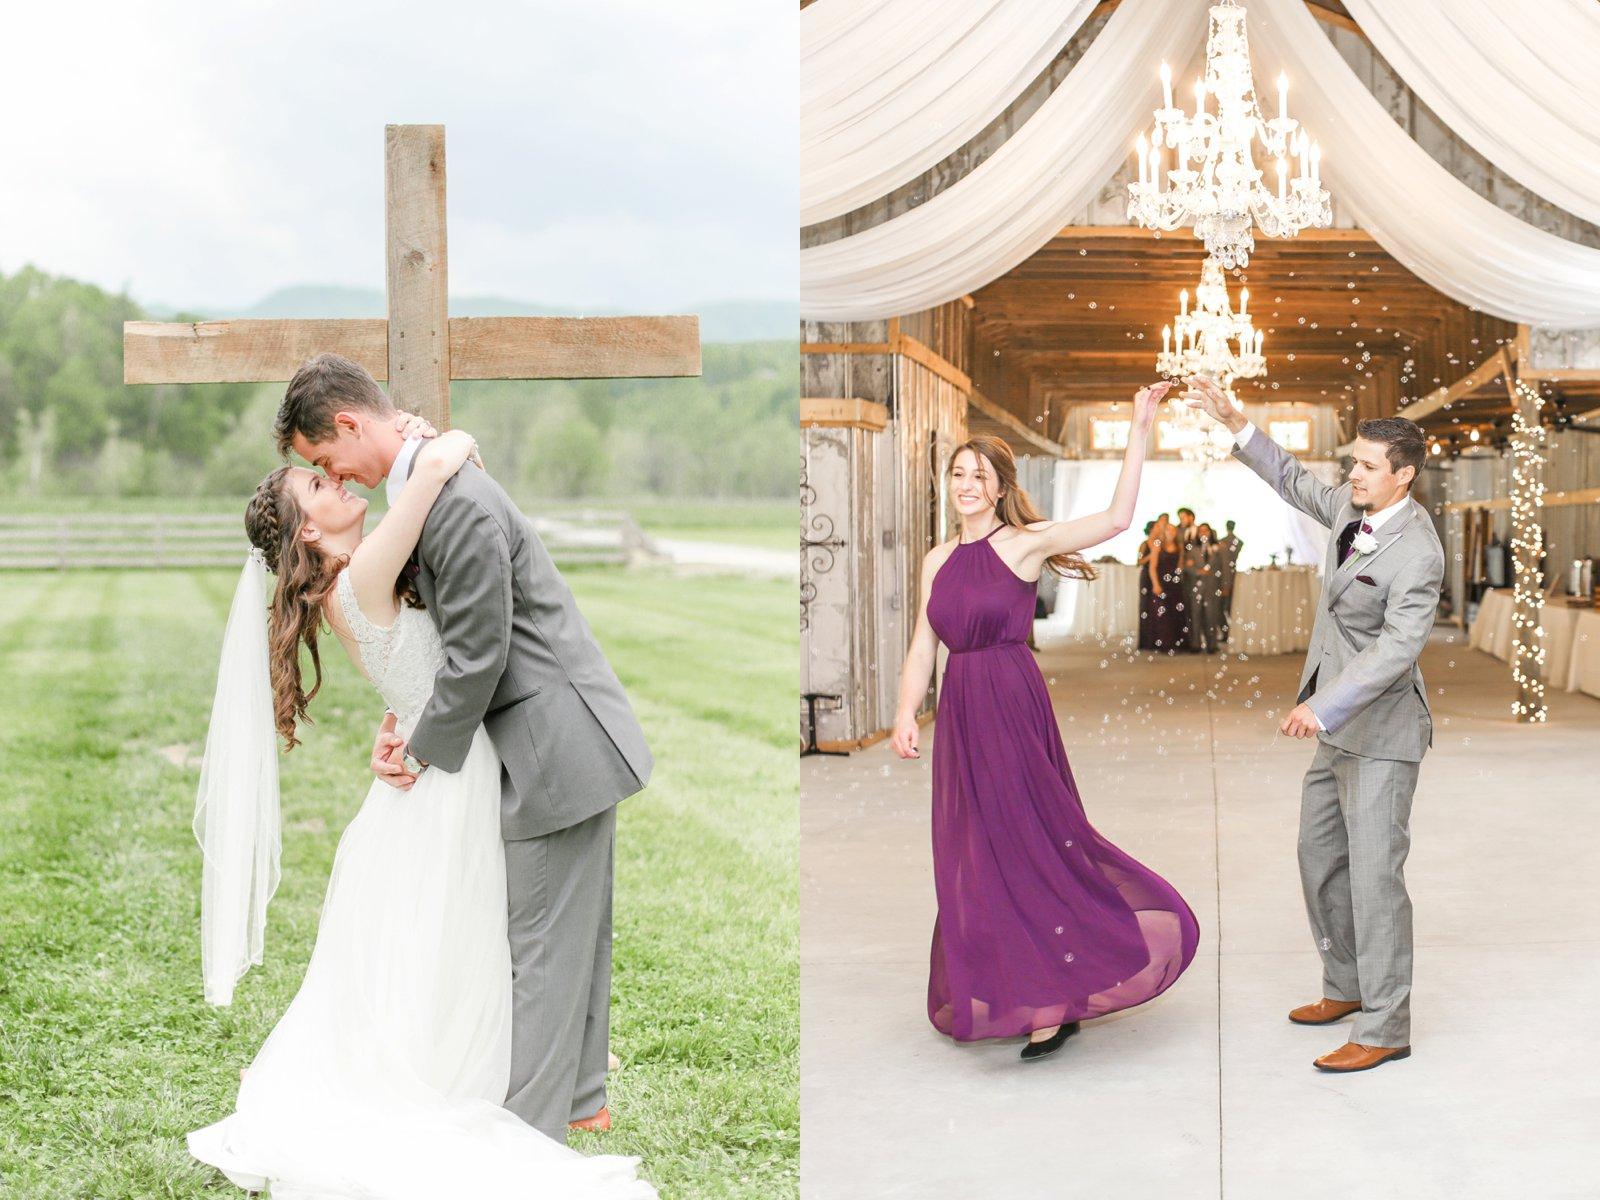 wedding_photographer_Missouri_Destination_elope_intimate_Saint_James_MO_Missouri_KansasCity_Jeff_City_Jefferson_Columbia_Engagement_Photos_Pictures_Session_Best_Videographer_0206.jpg